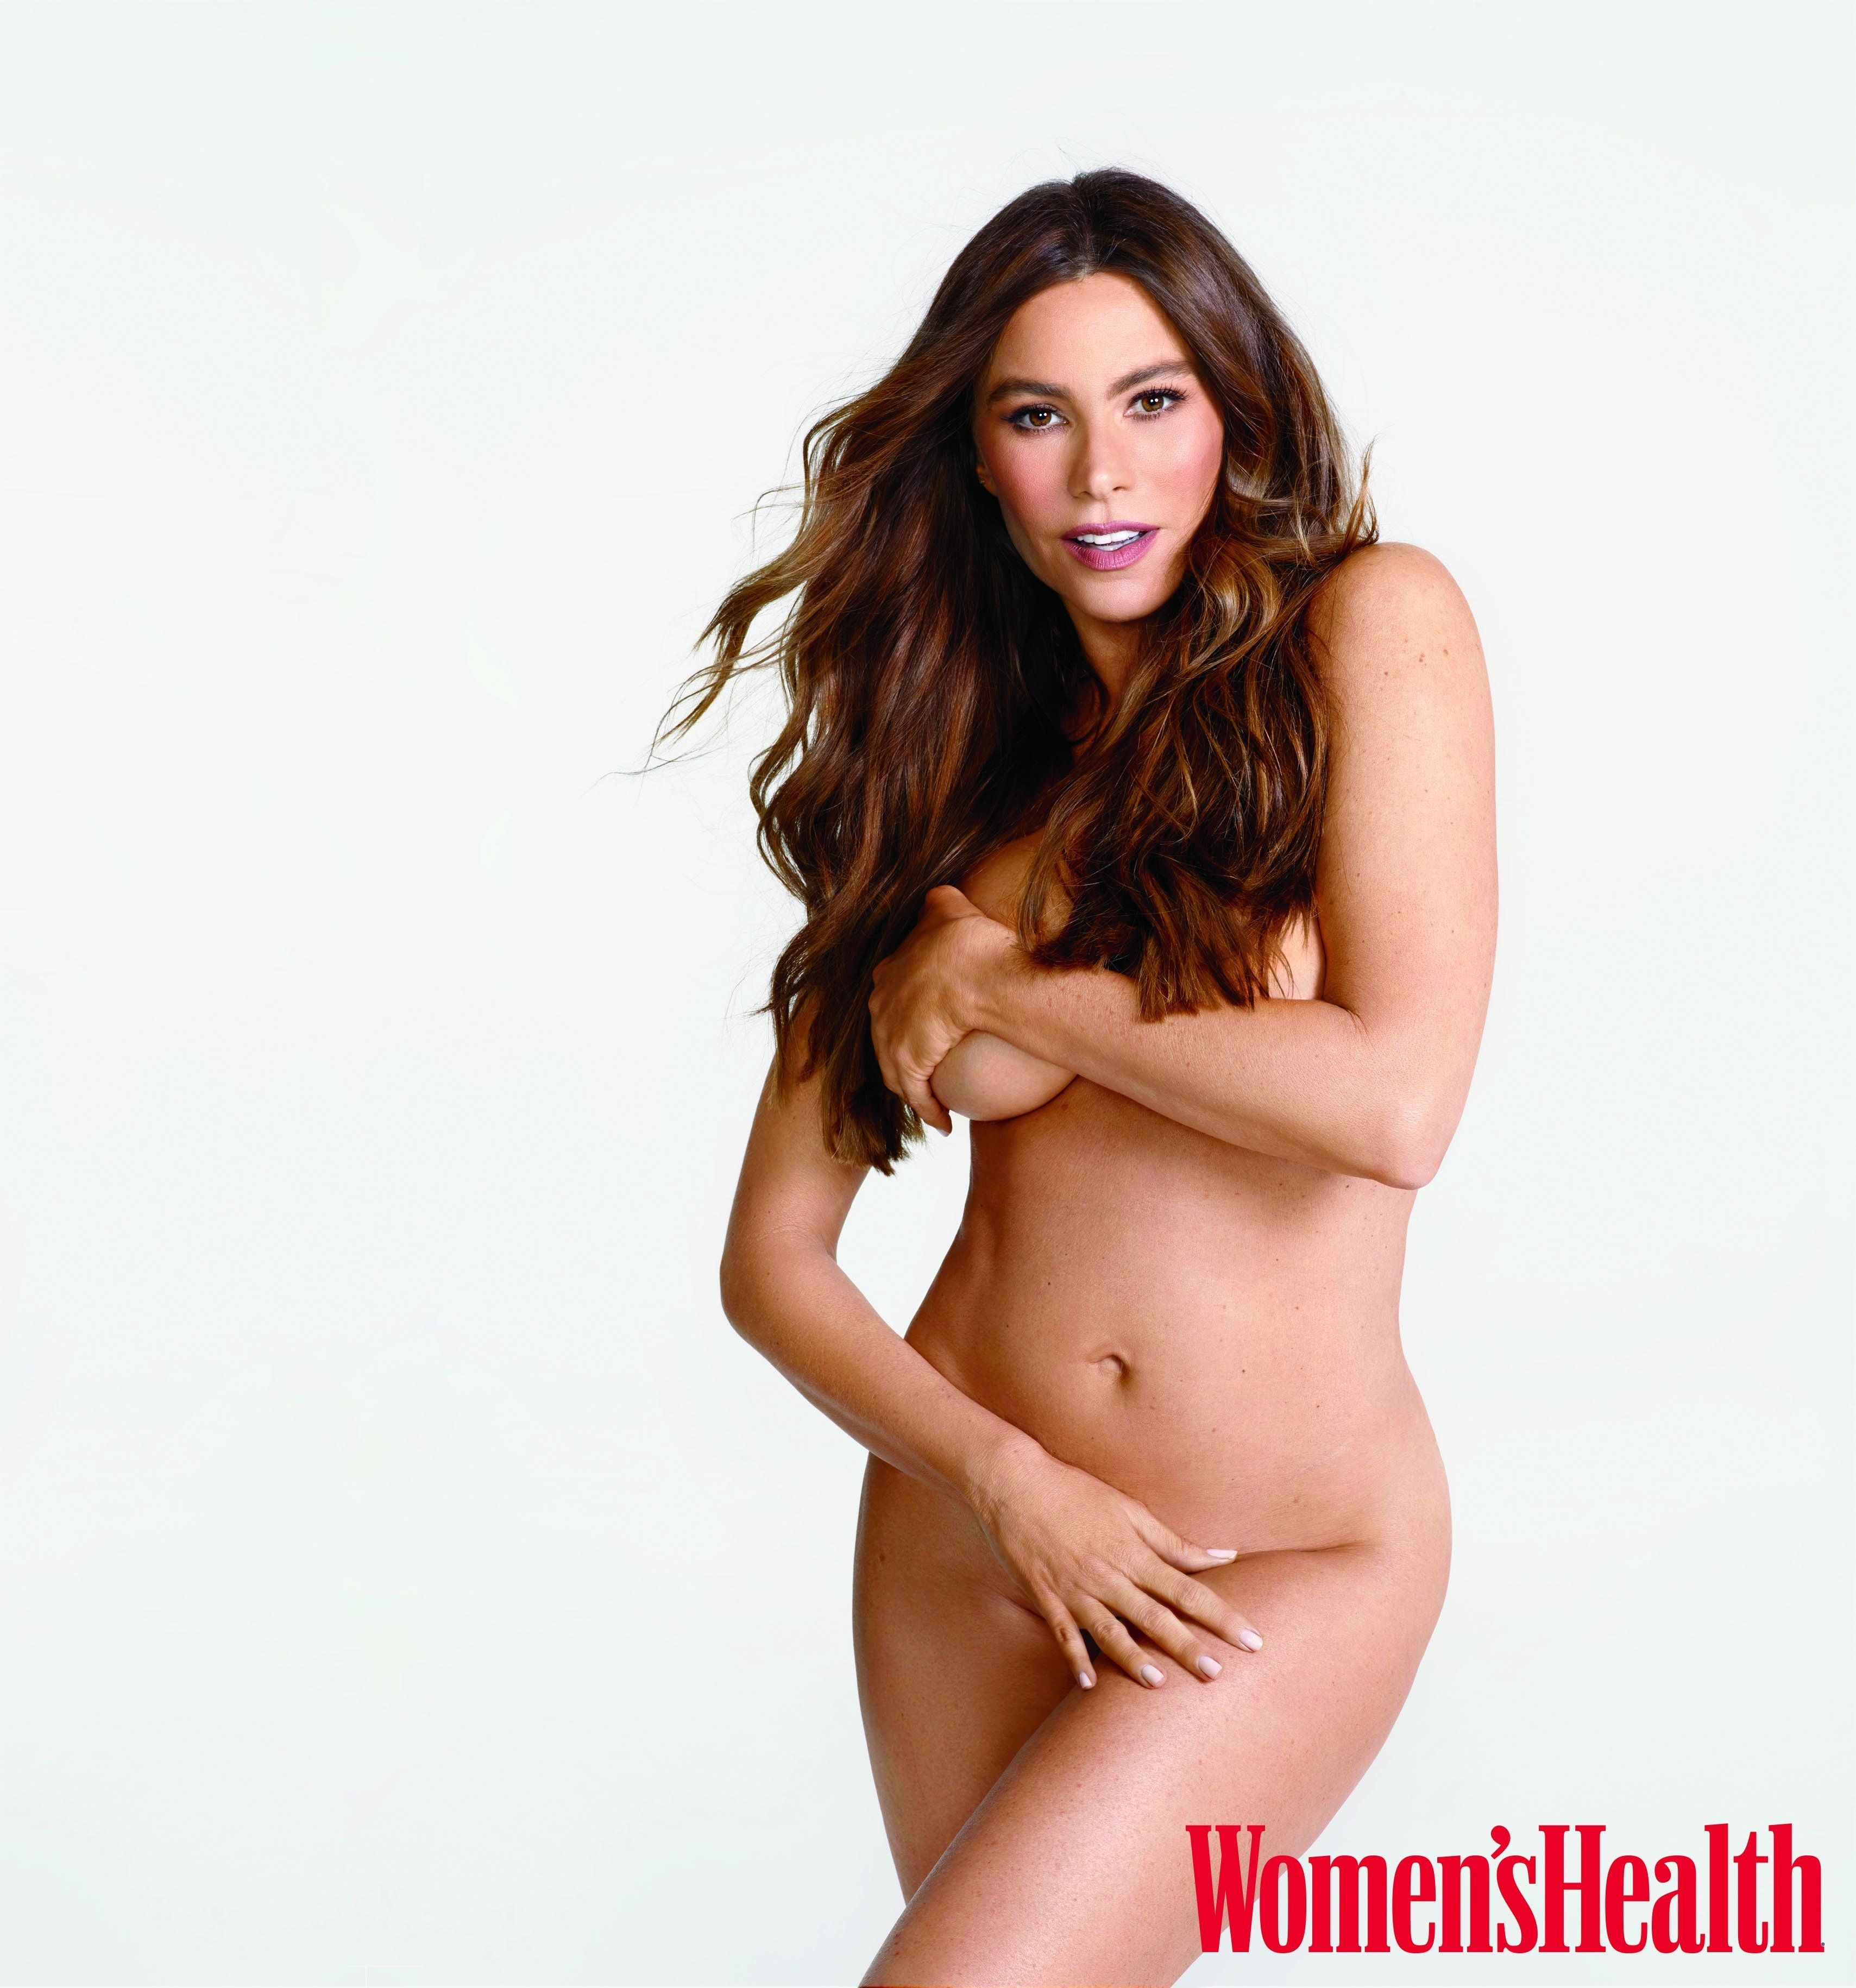 Sofia Vergara Naked Fake Best vergara can't do pushups because of her 'gigantic boobs'